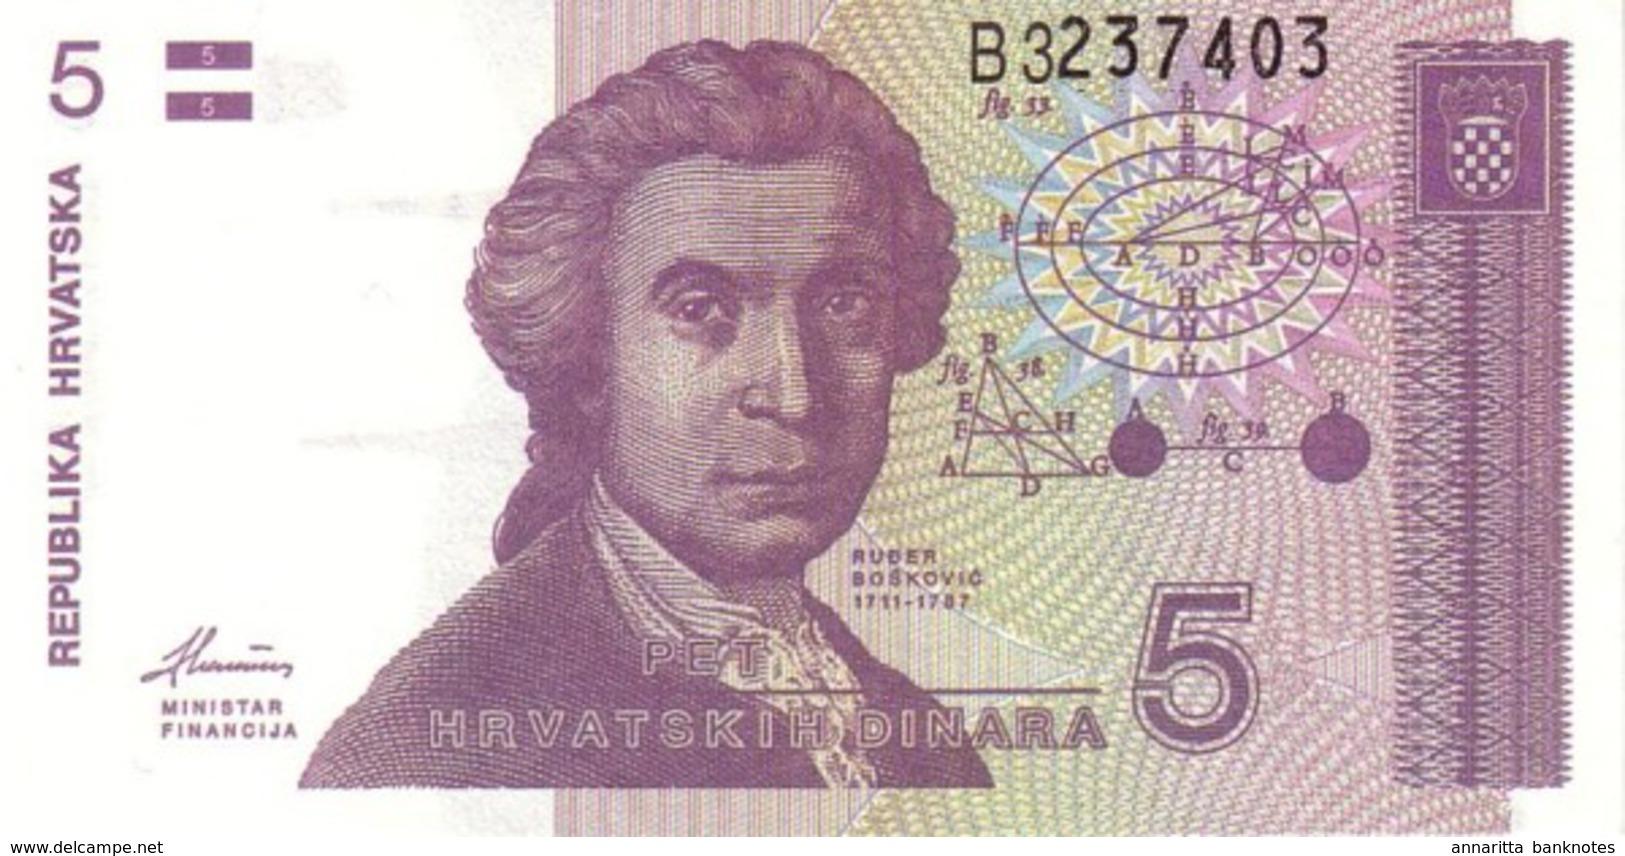 CROATIA 5 DINARS 1991 UNC [ HR302a ] - Croatia